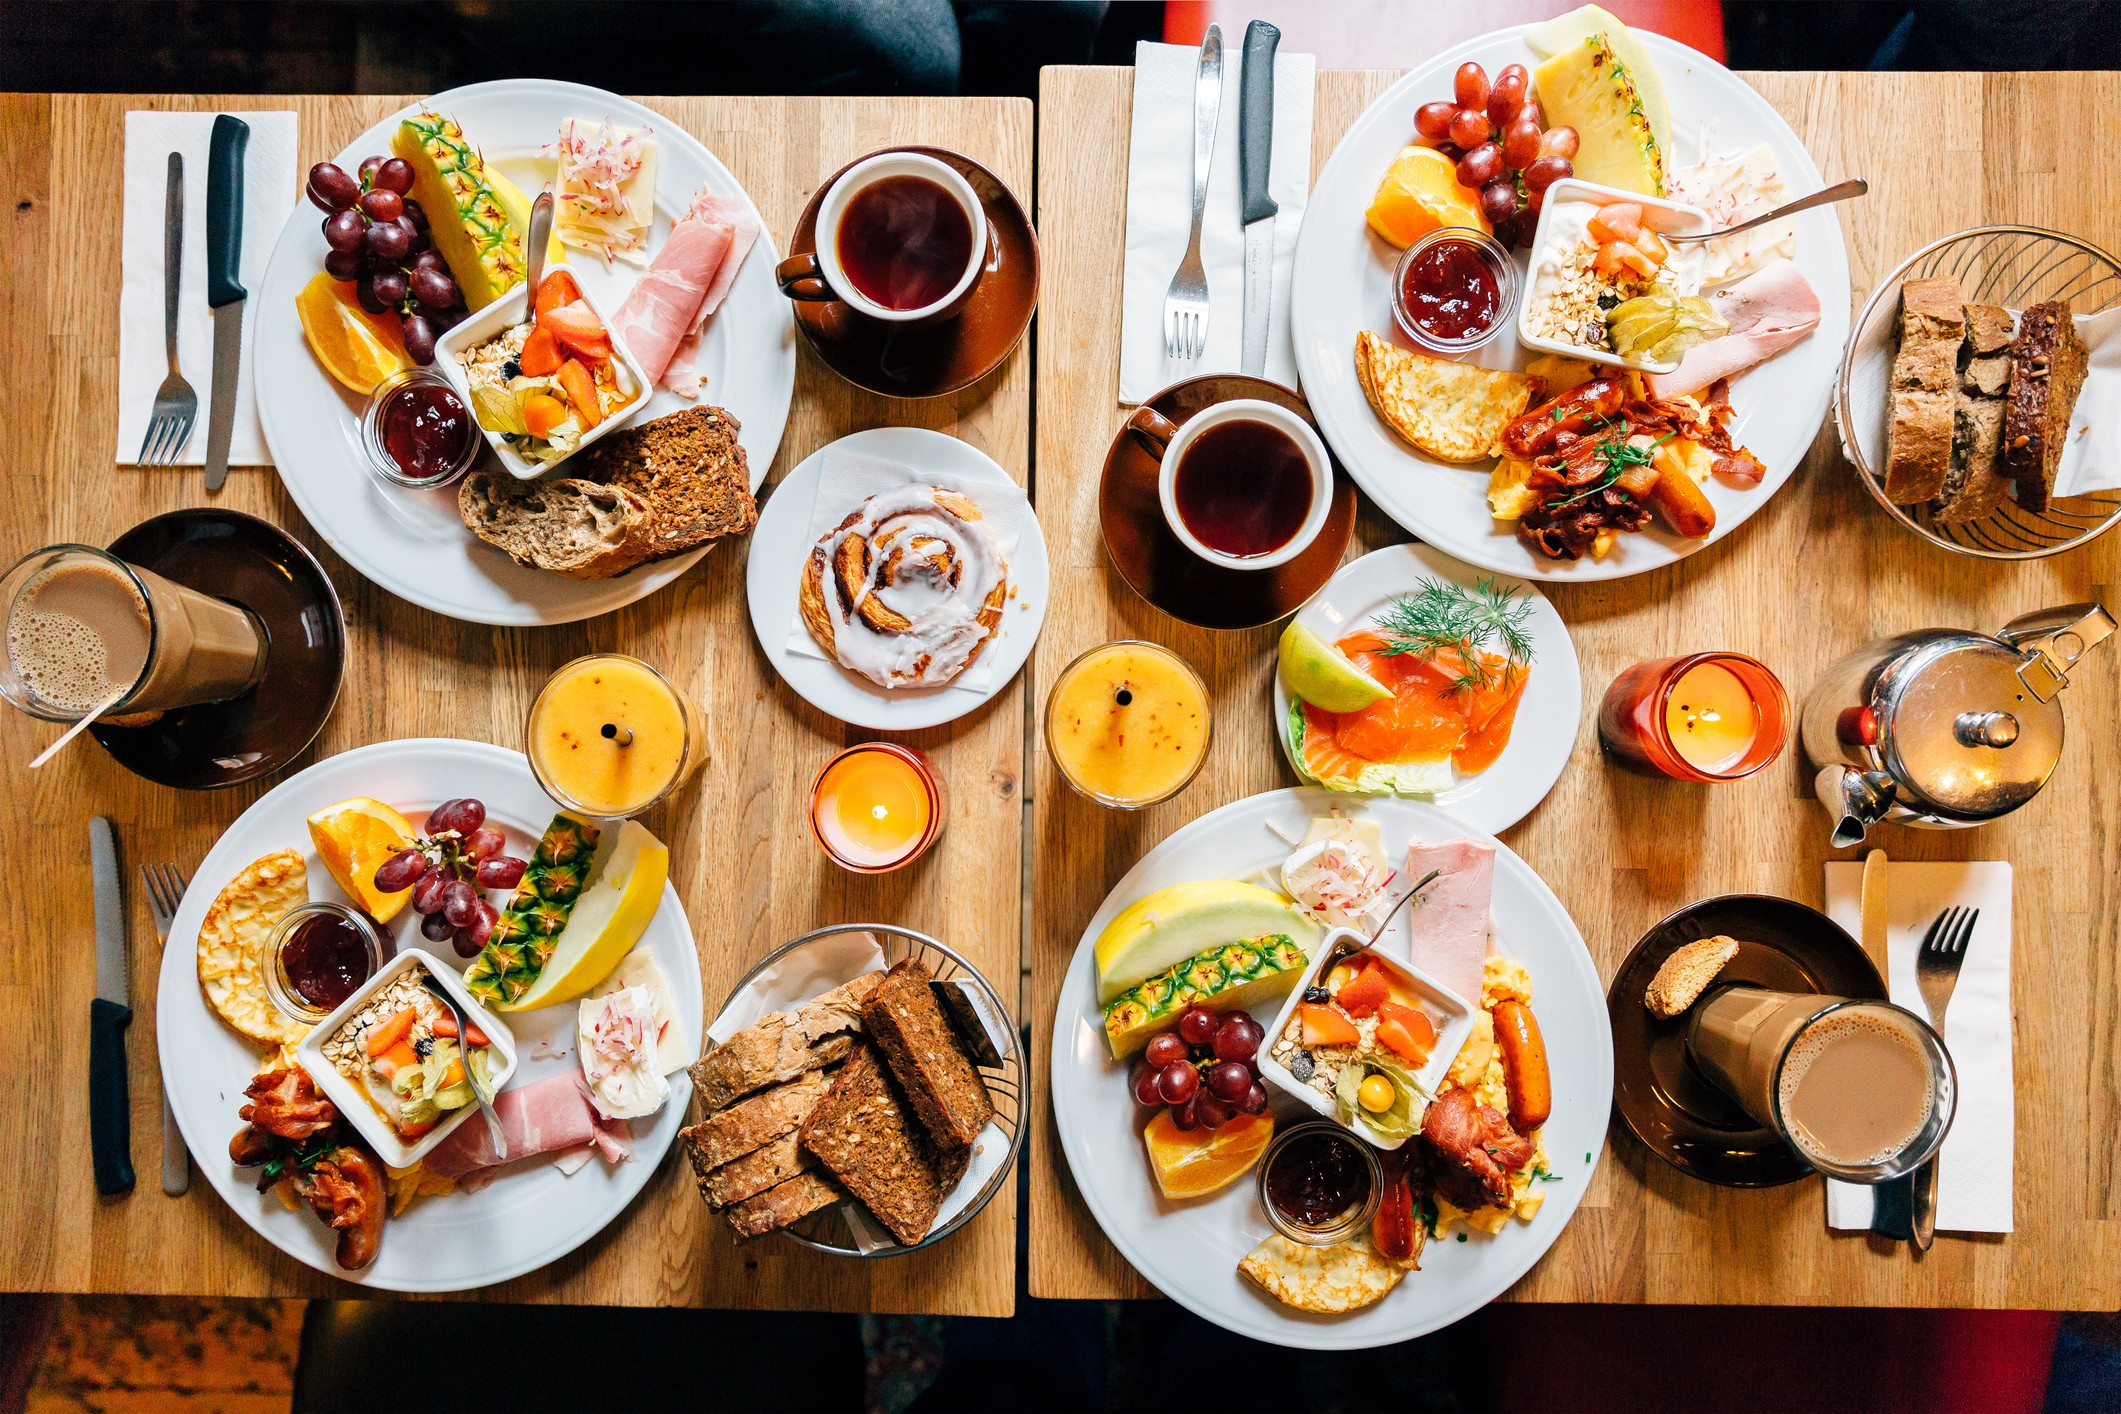 Copenhagen has a lot going for it when it comes to brunch